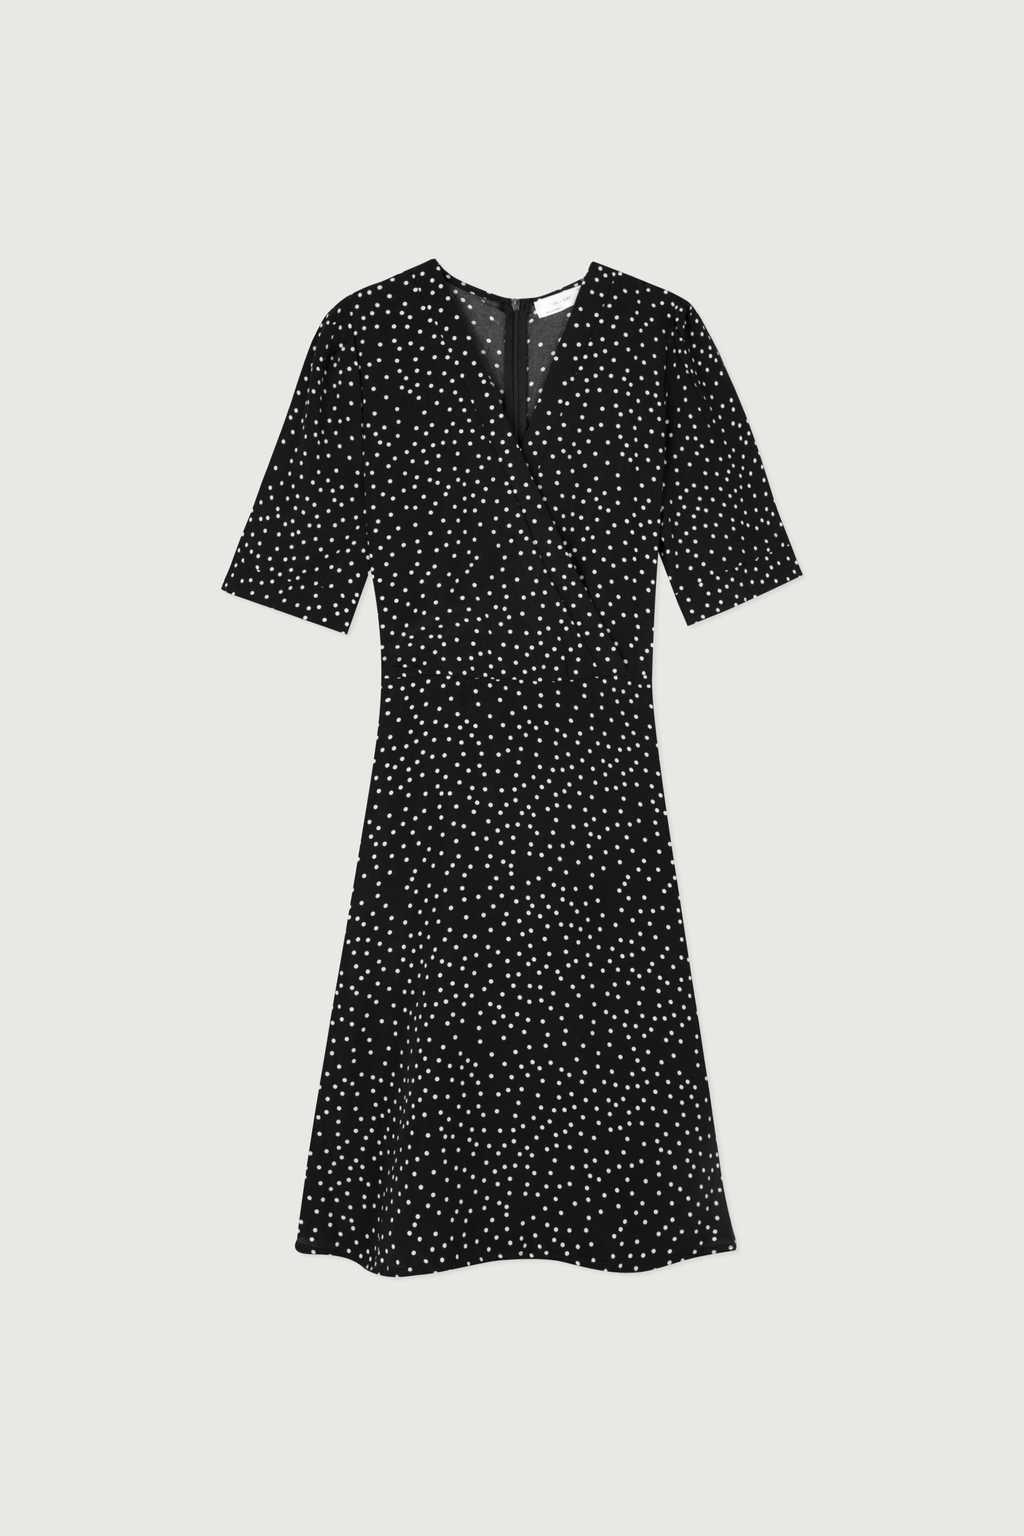 Dress K026 Black 5